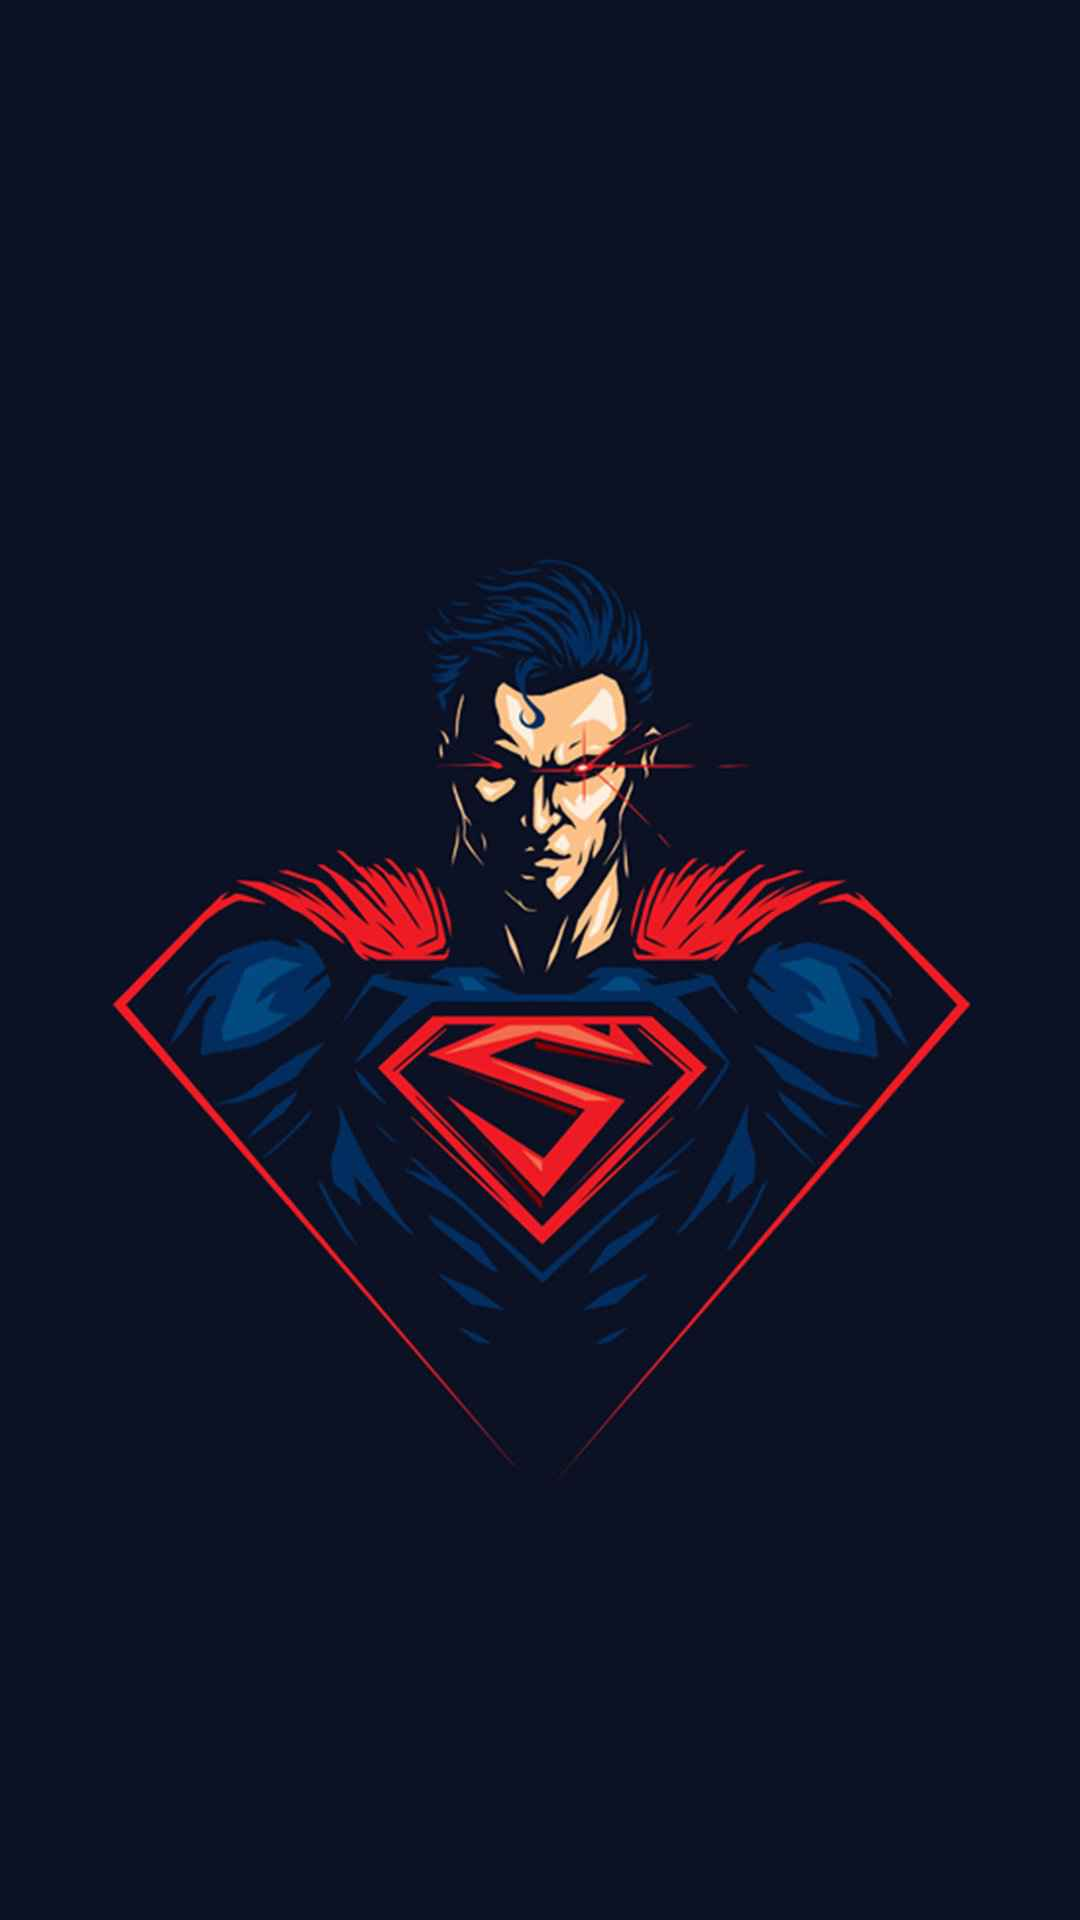 Superman superhero iPhone Wallpaper